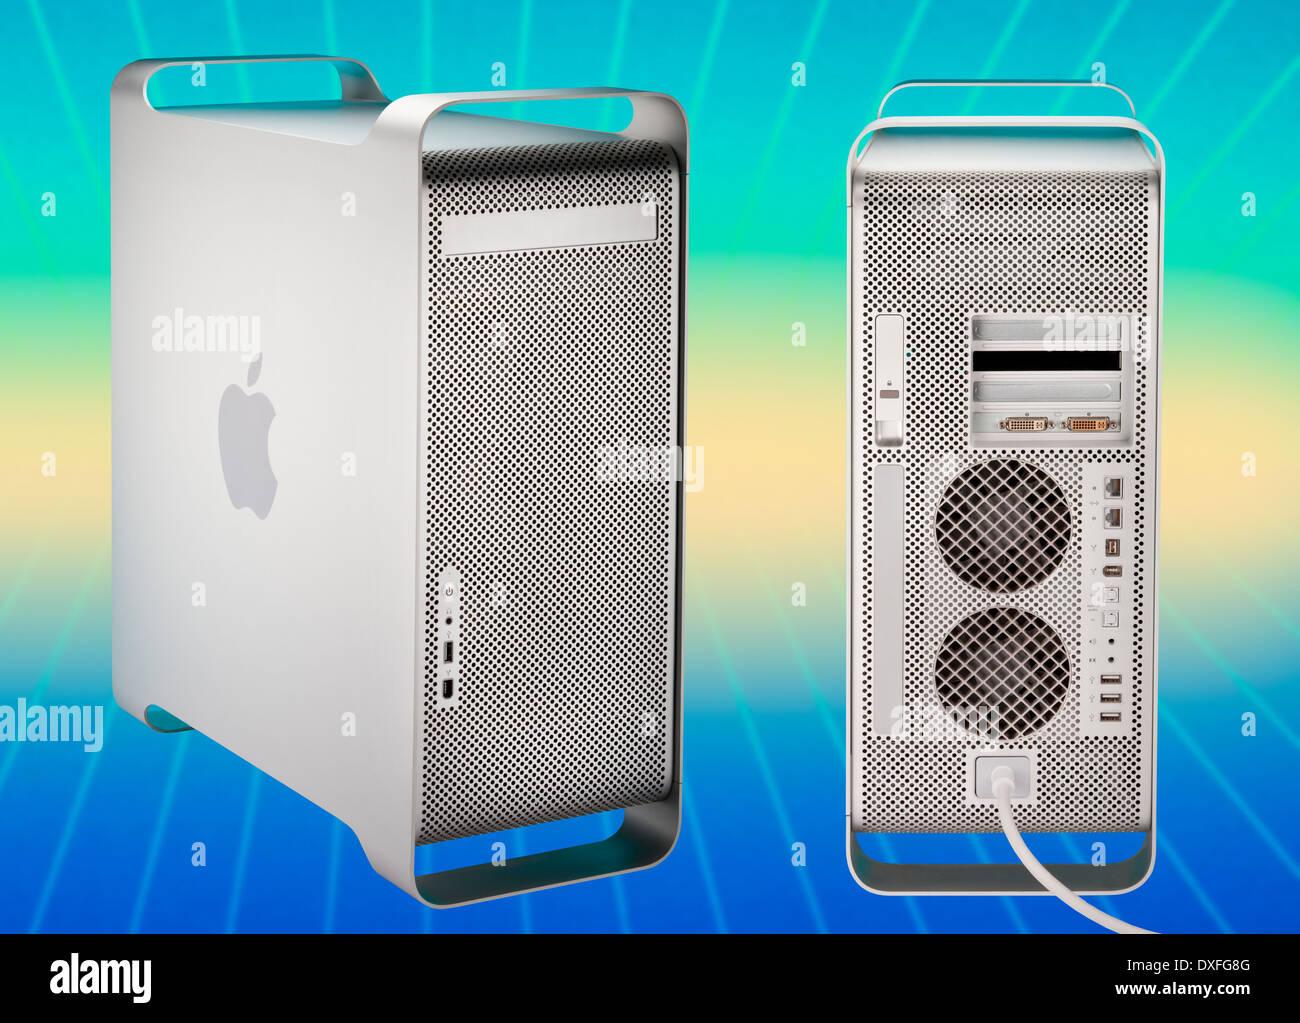 Power Mac G5 Apple Computer - Retro Photo Stock